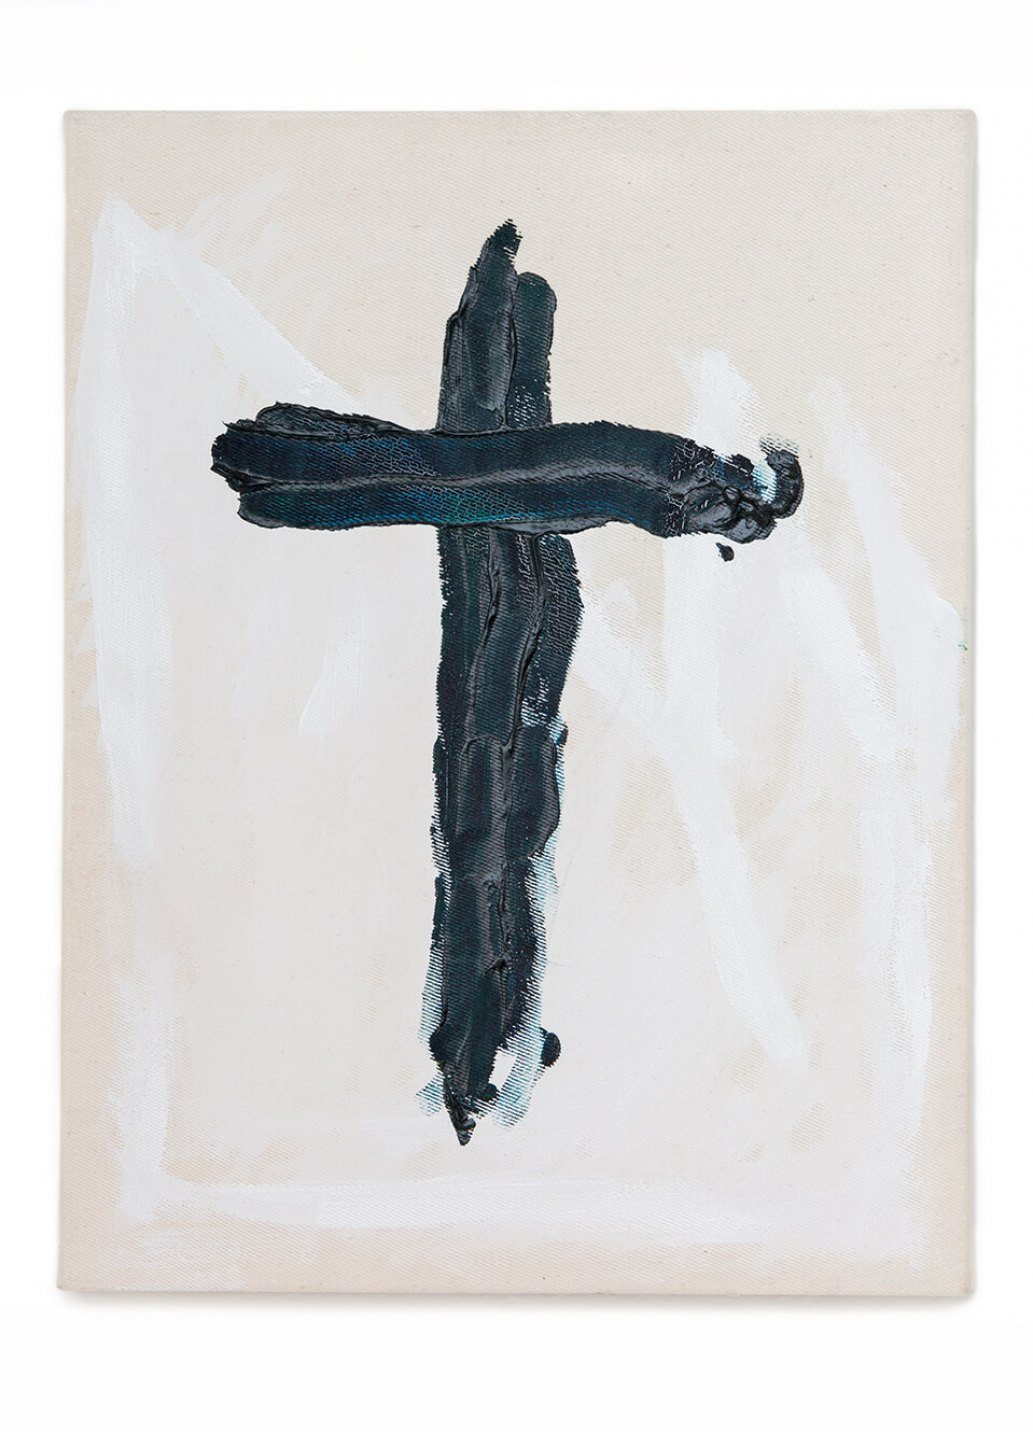 Anderson Godinho, <em>Cruz</em>, 2014, oil on canvas, 35 ×27 cm - Mendes Wood DM